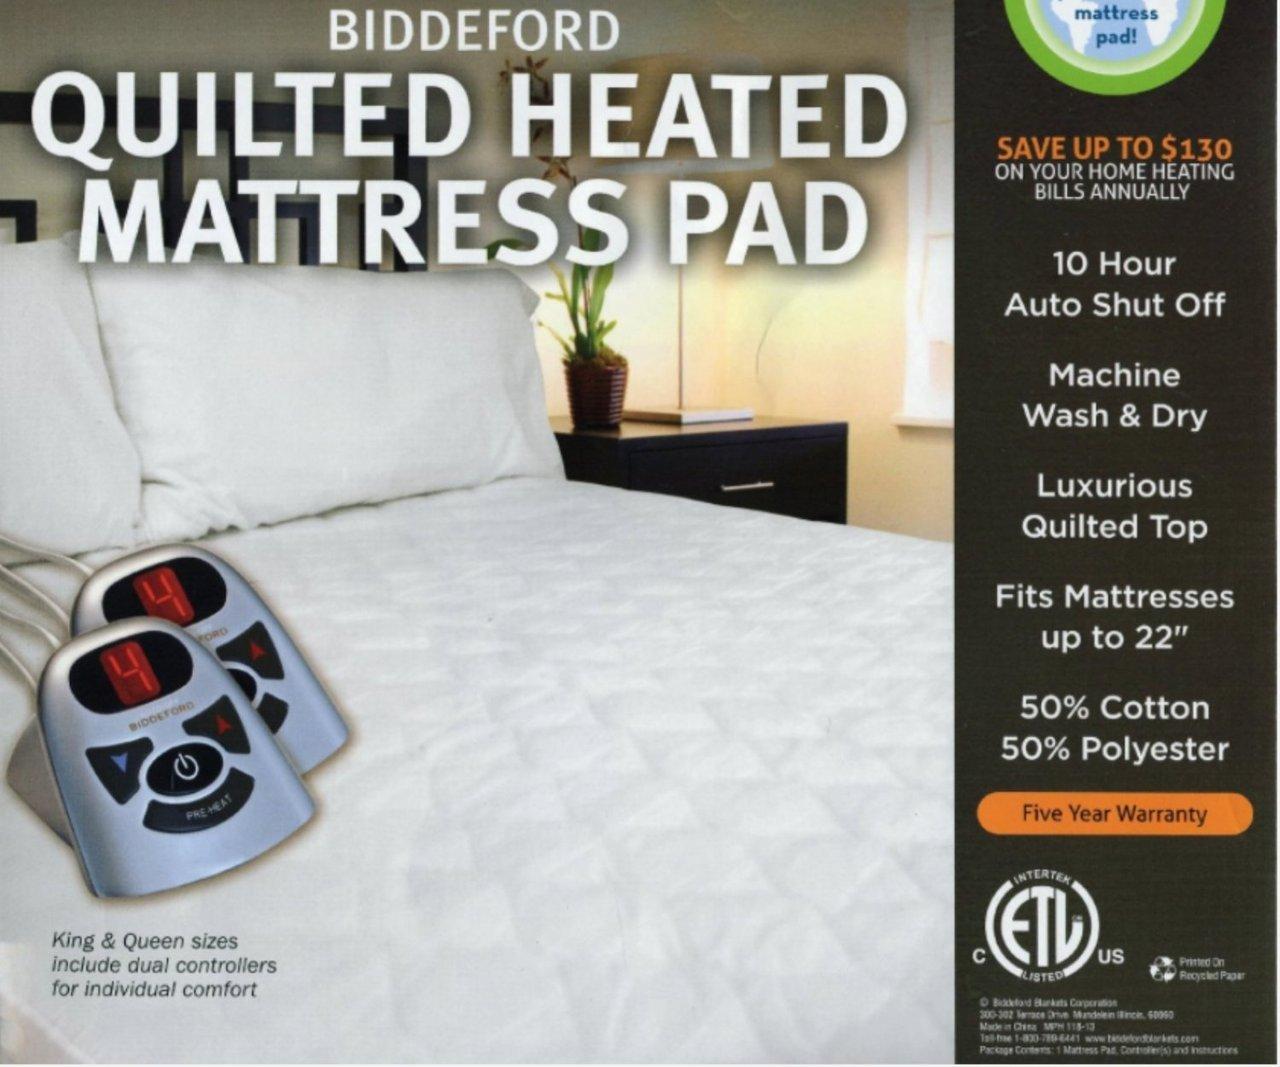 sharpen prd product jsp op biddeford wid mattress hei heated sherpa pad